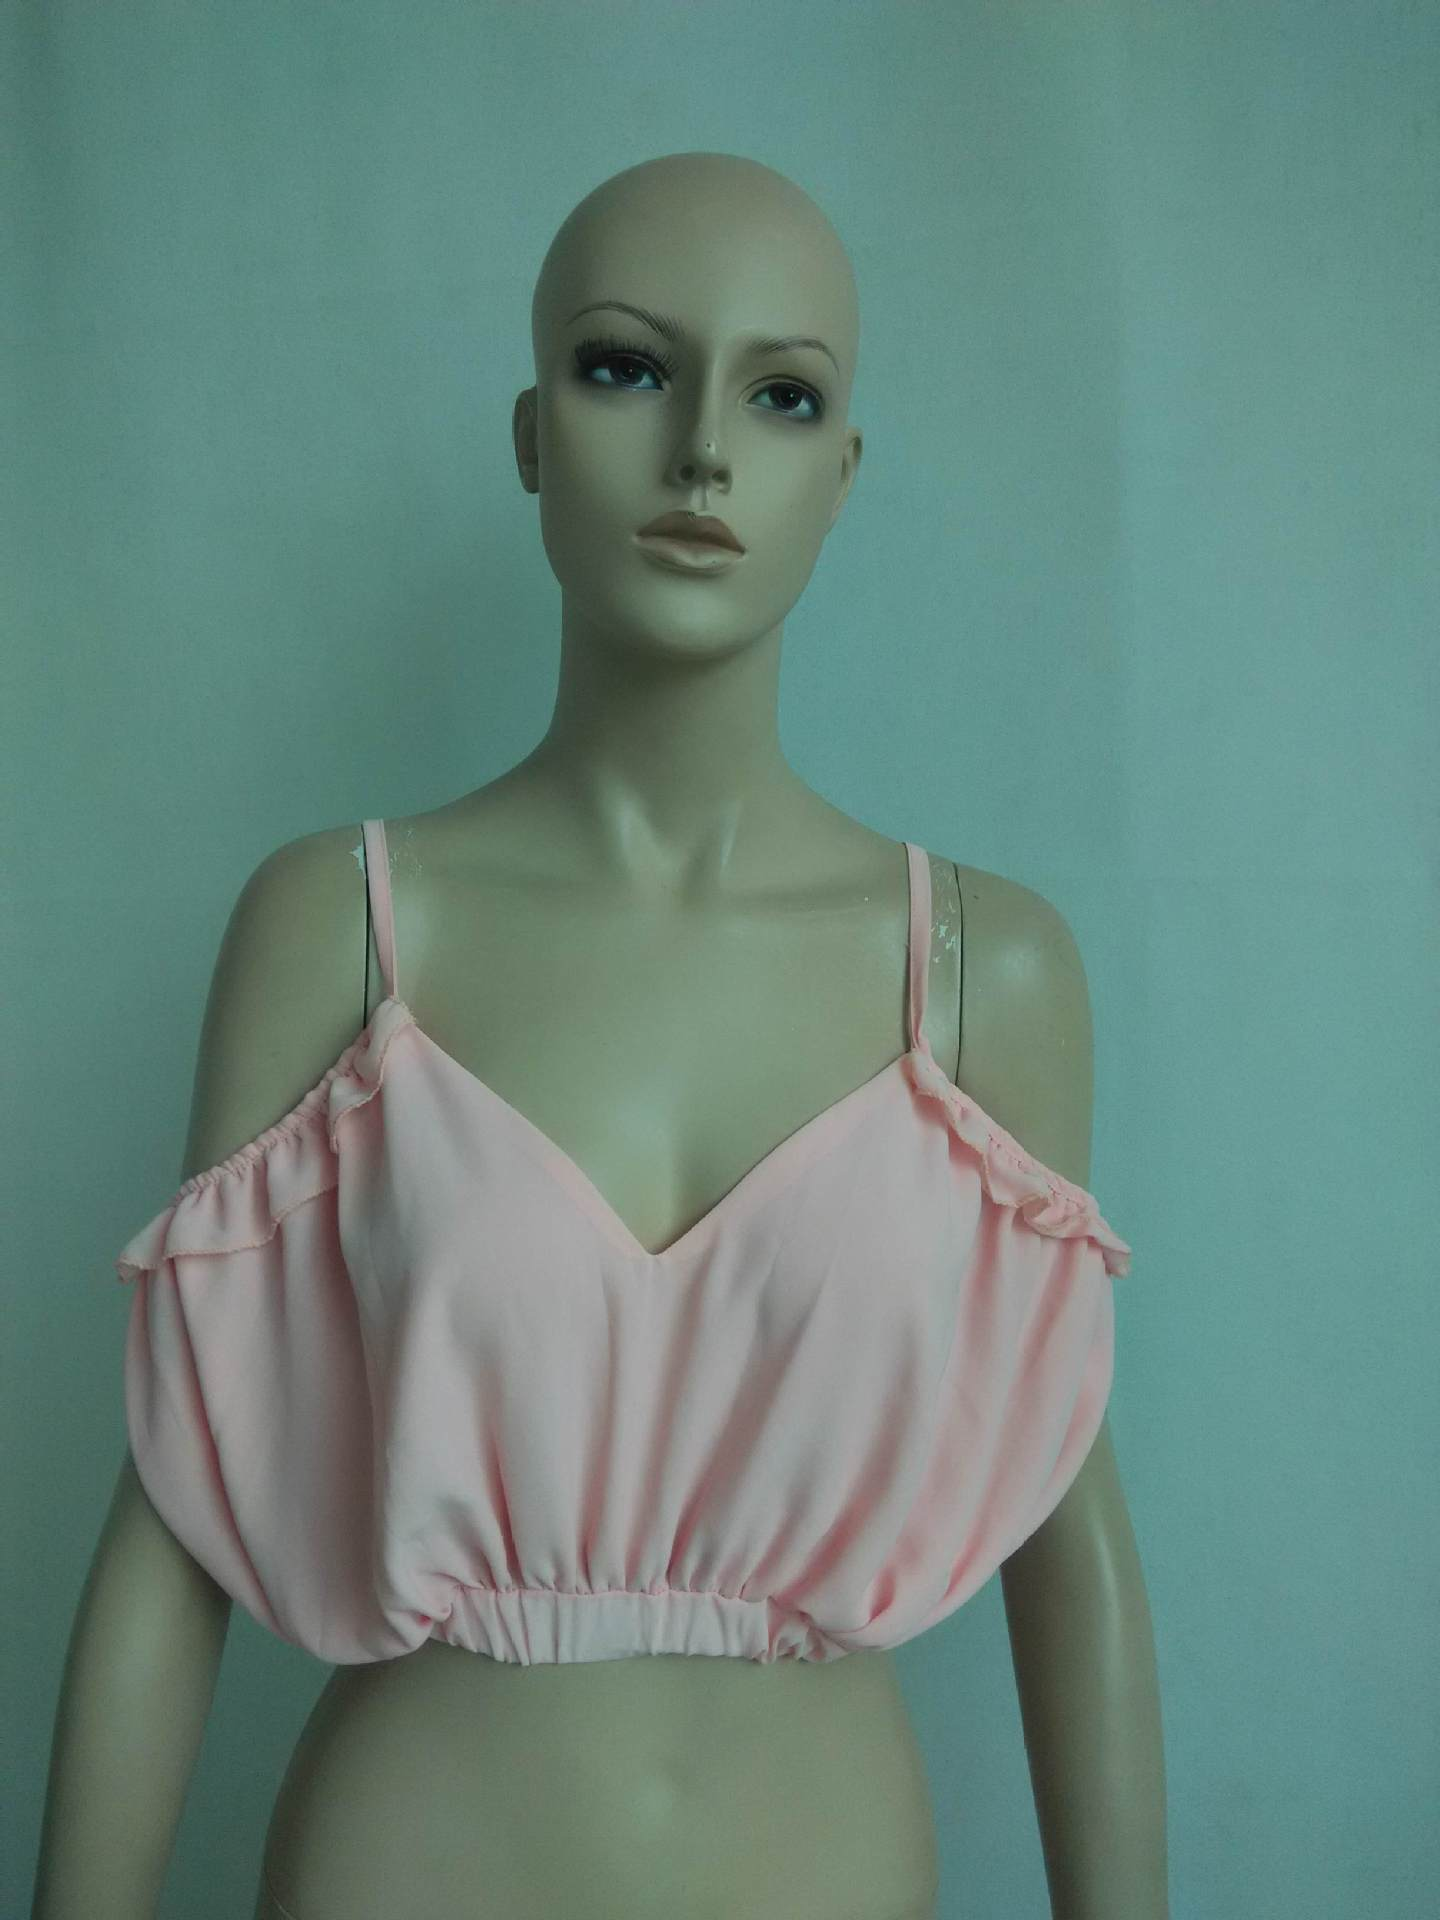 Cheap Sexy V Neck Spaghetti Strap Off The Shoulder Sleeveless Solid Pink Chiffon Shirt